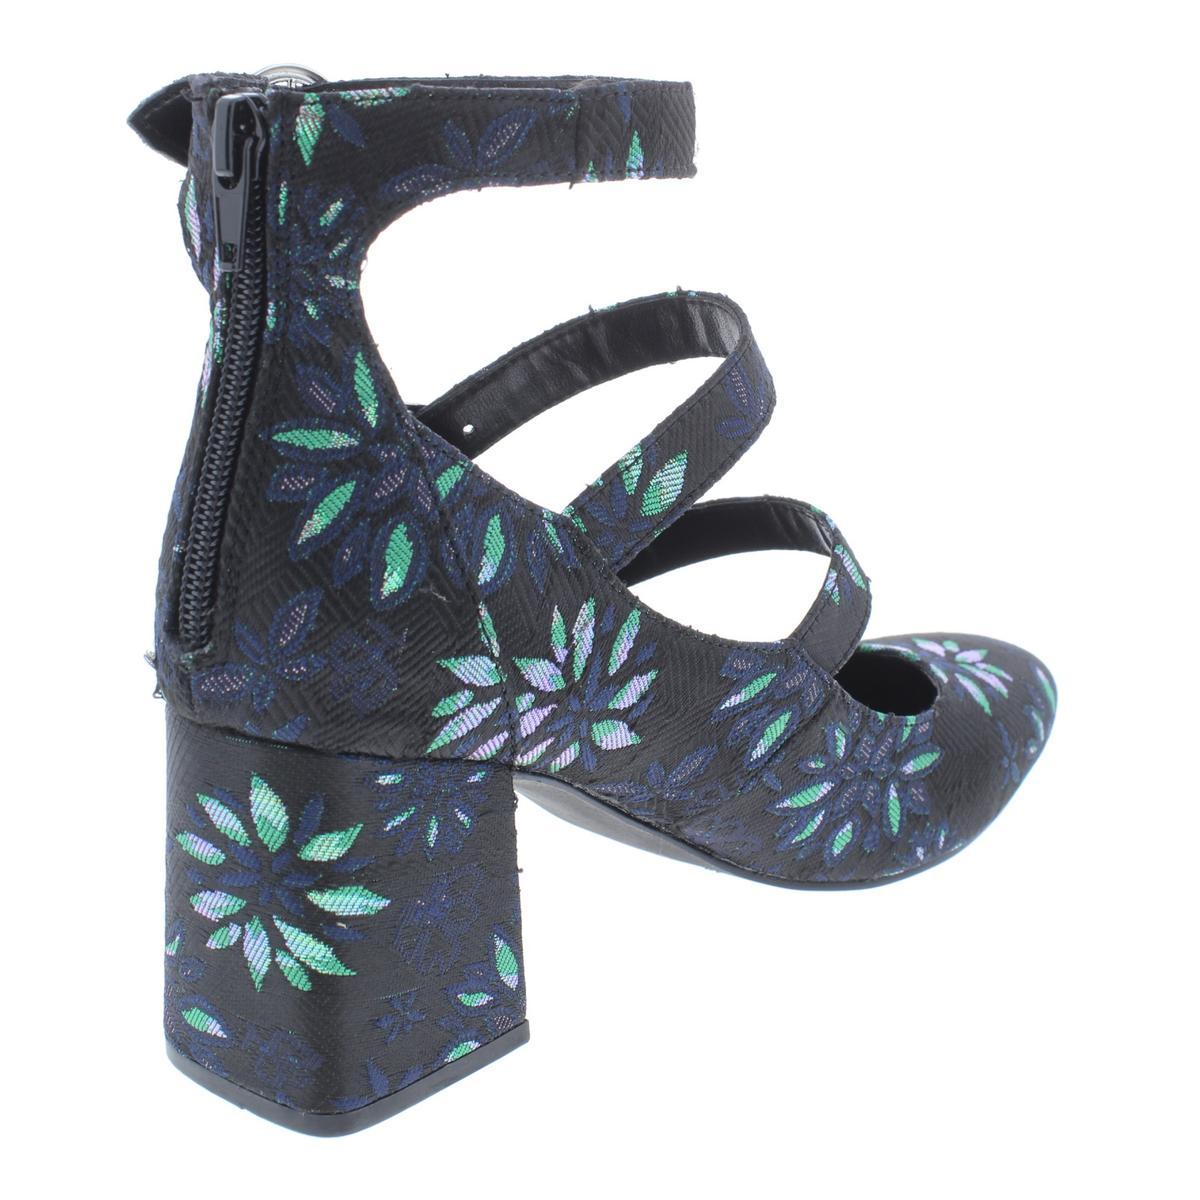 Indigo-Rd-Womens-Jallen-Crushed-Velvet-Dress-Block-Heels-Shoes-BHFO-6024 thumbnail 6